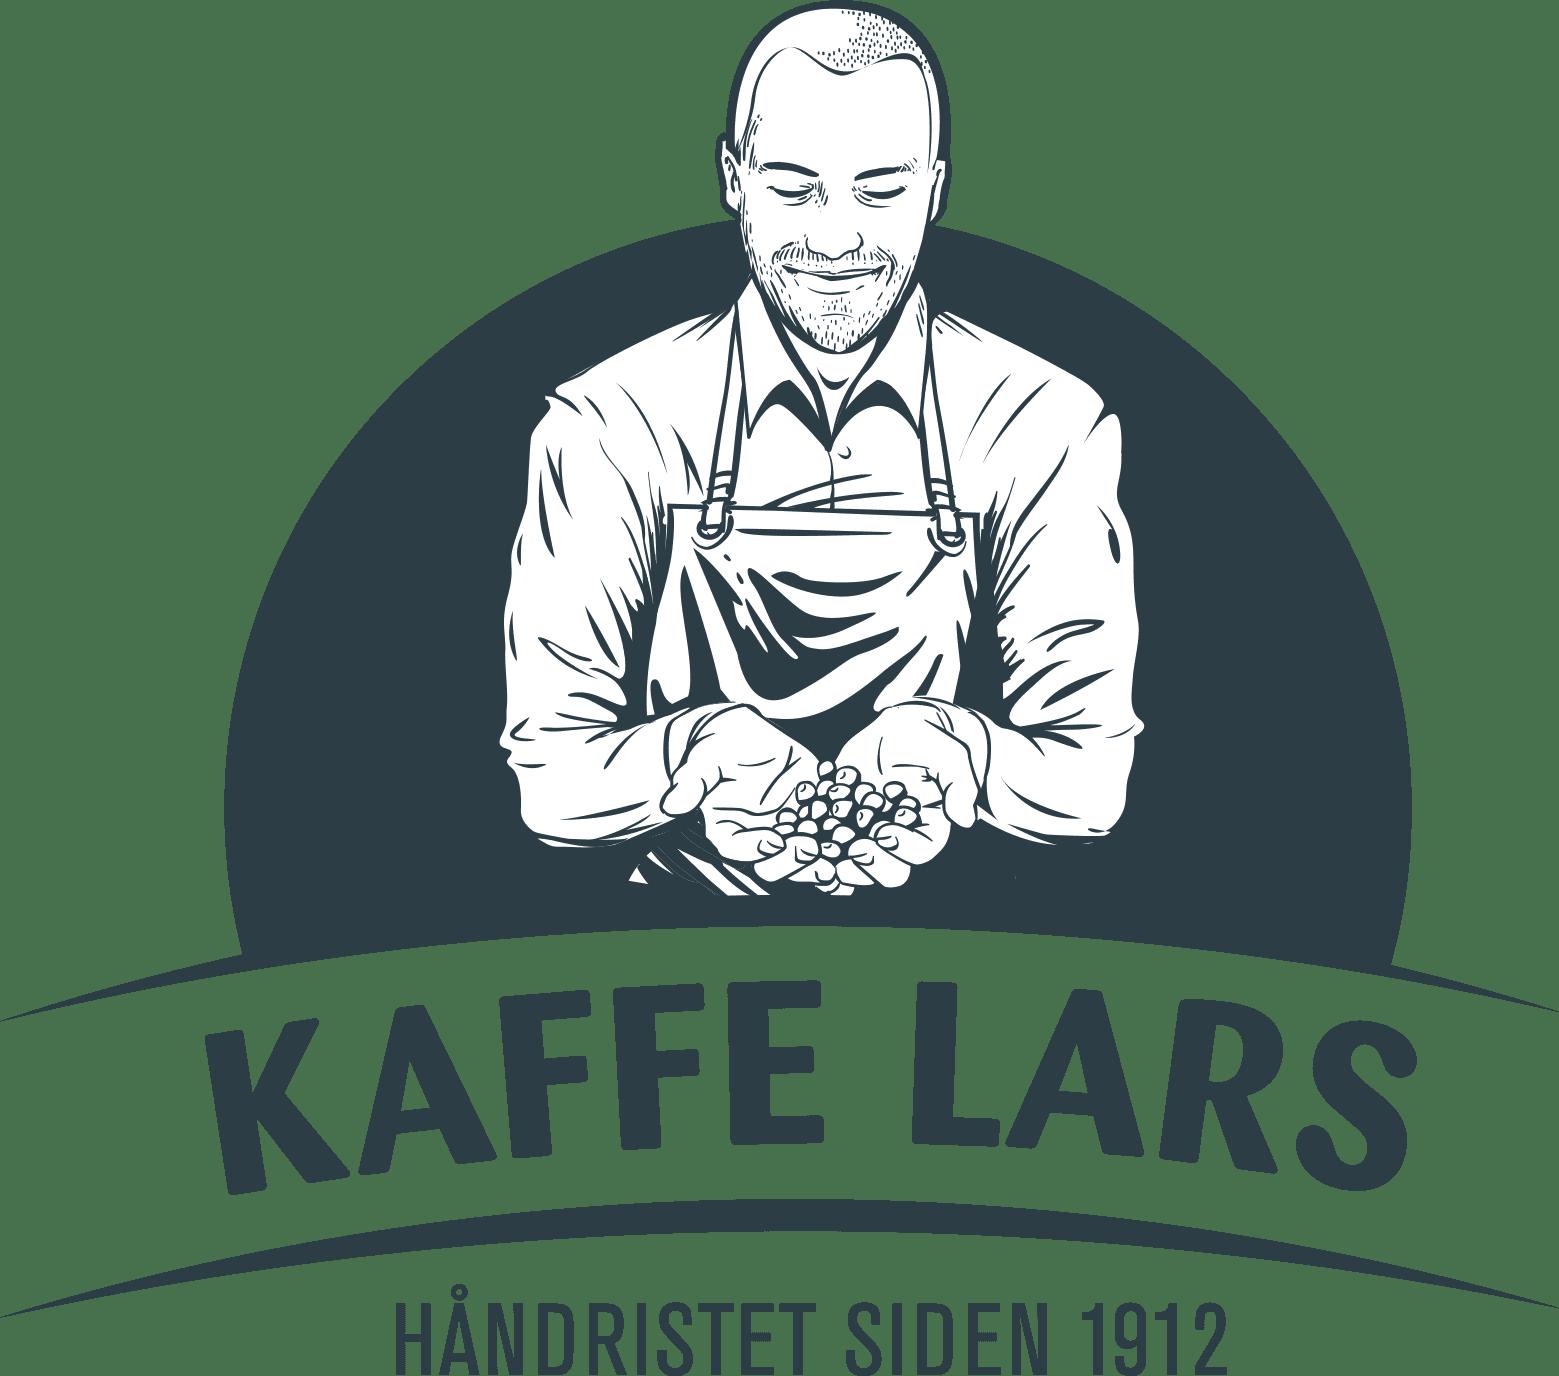 Kaffe Lars